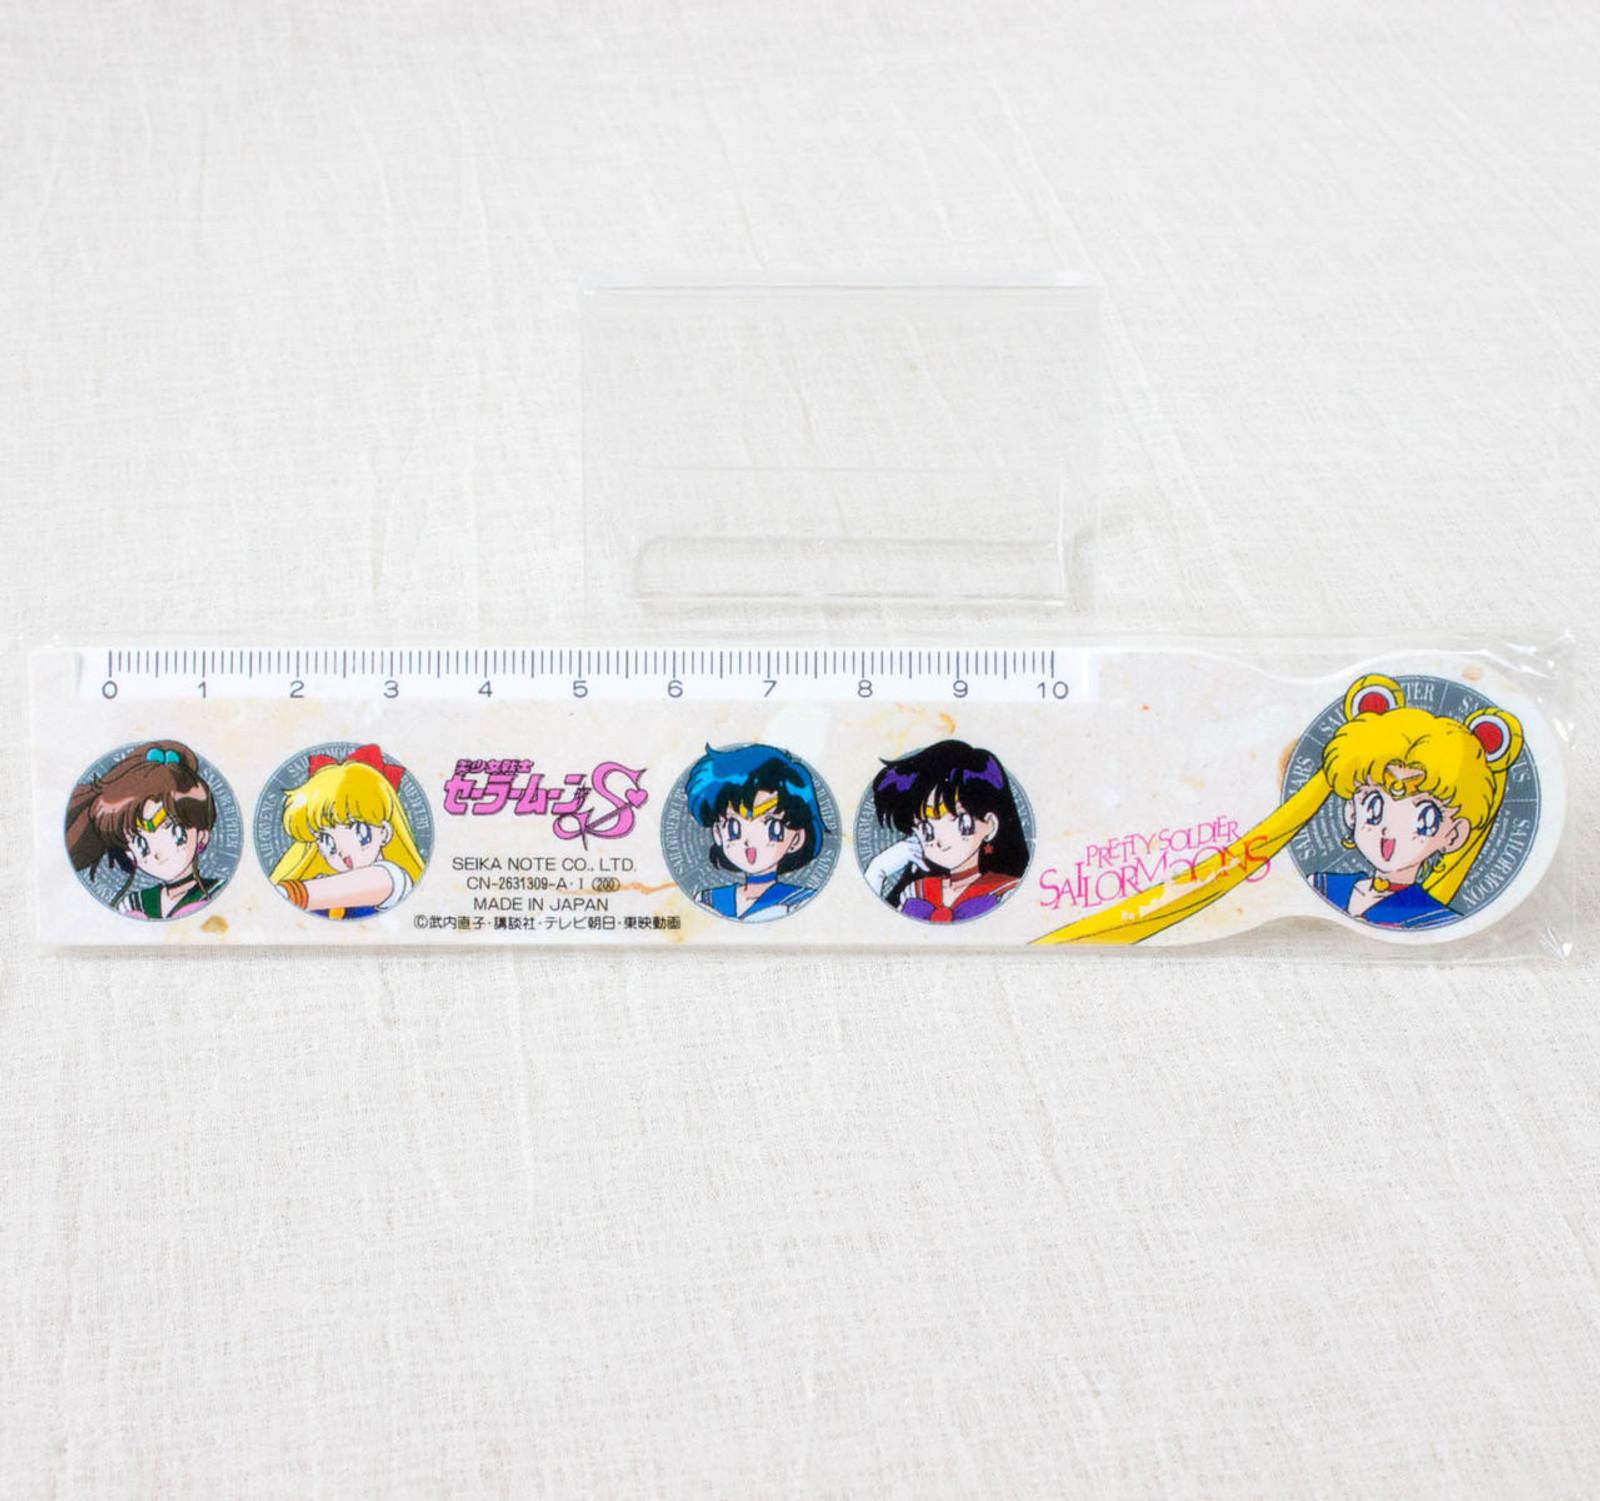 Retro RARE! Sailor Moon S Ruler 15cm SEIKA NOTE JAPAN ANIME MANGA